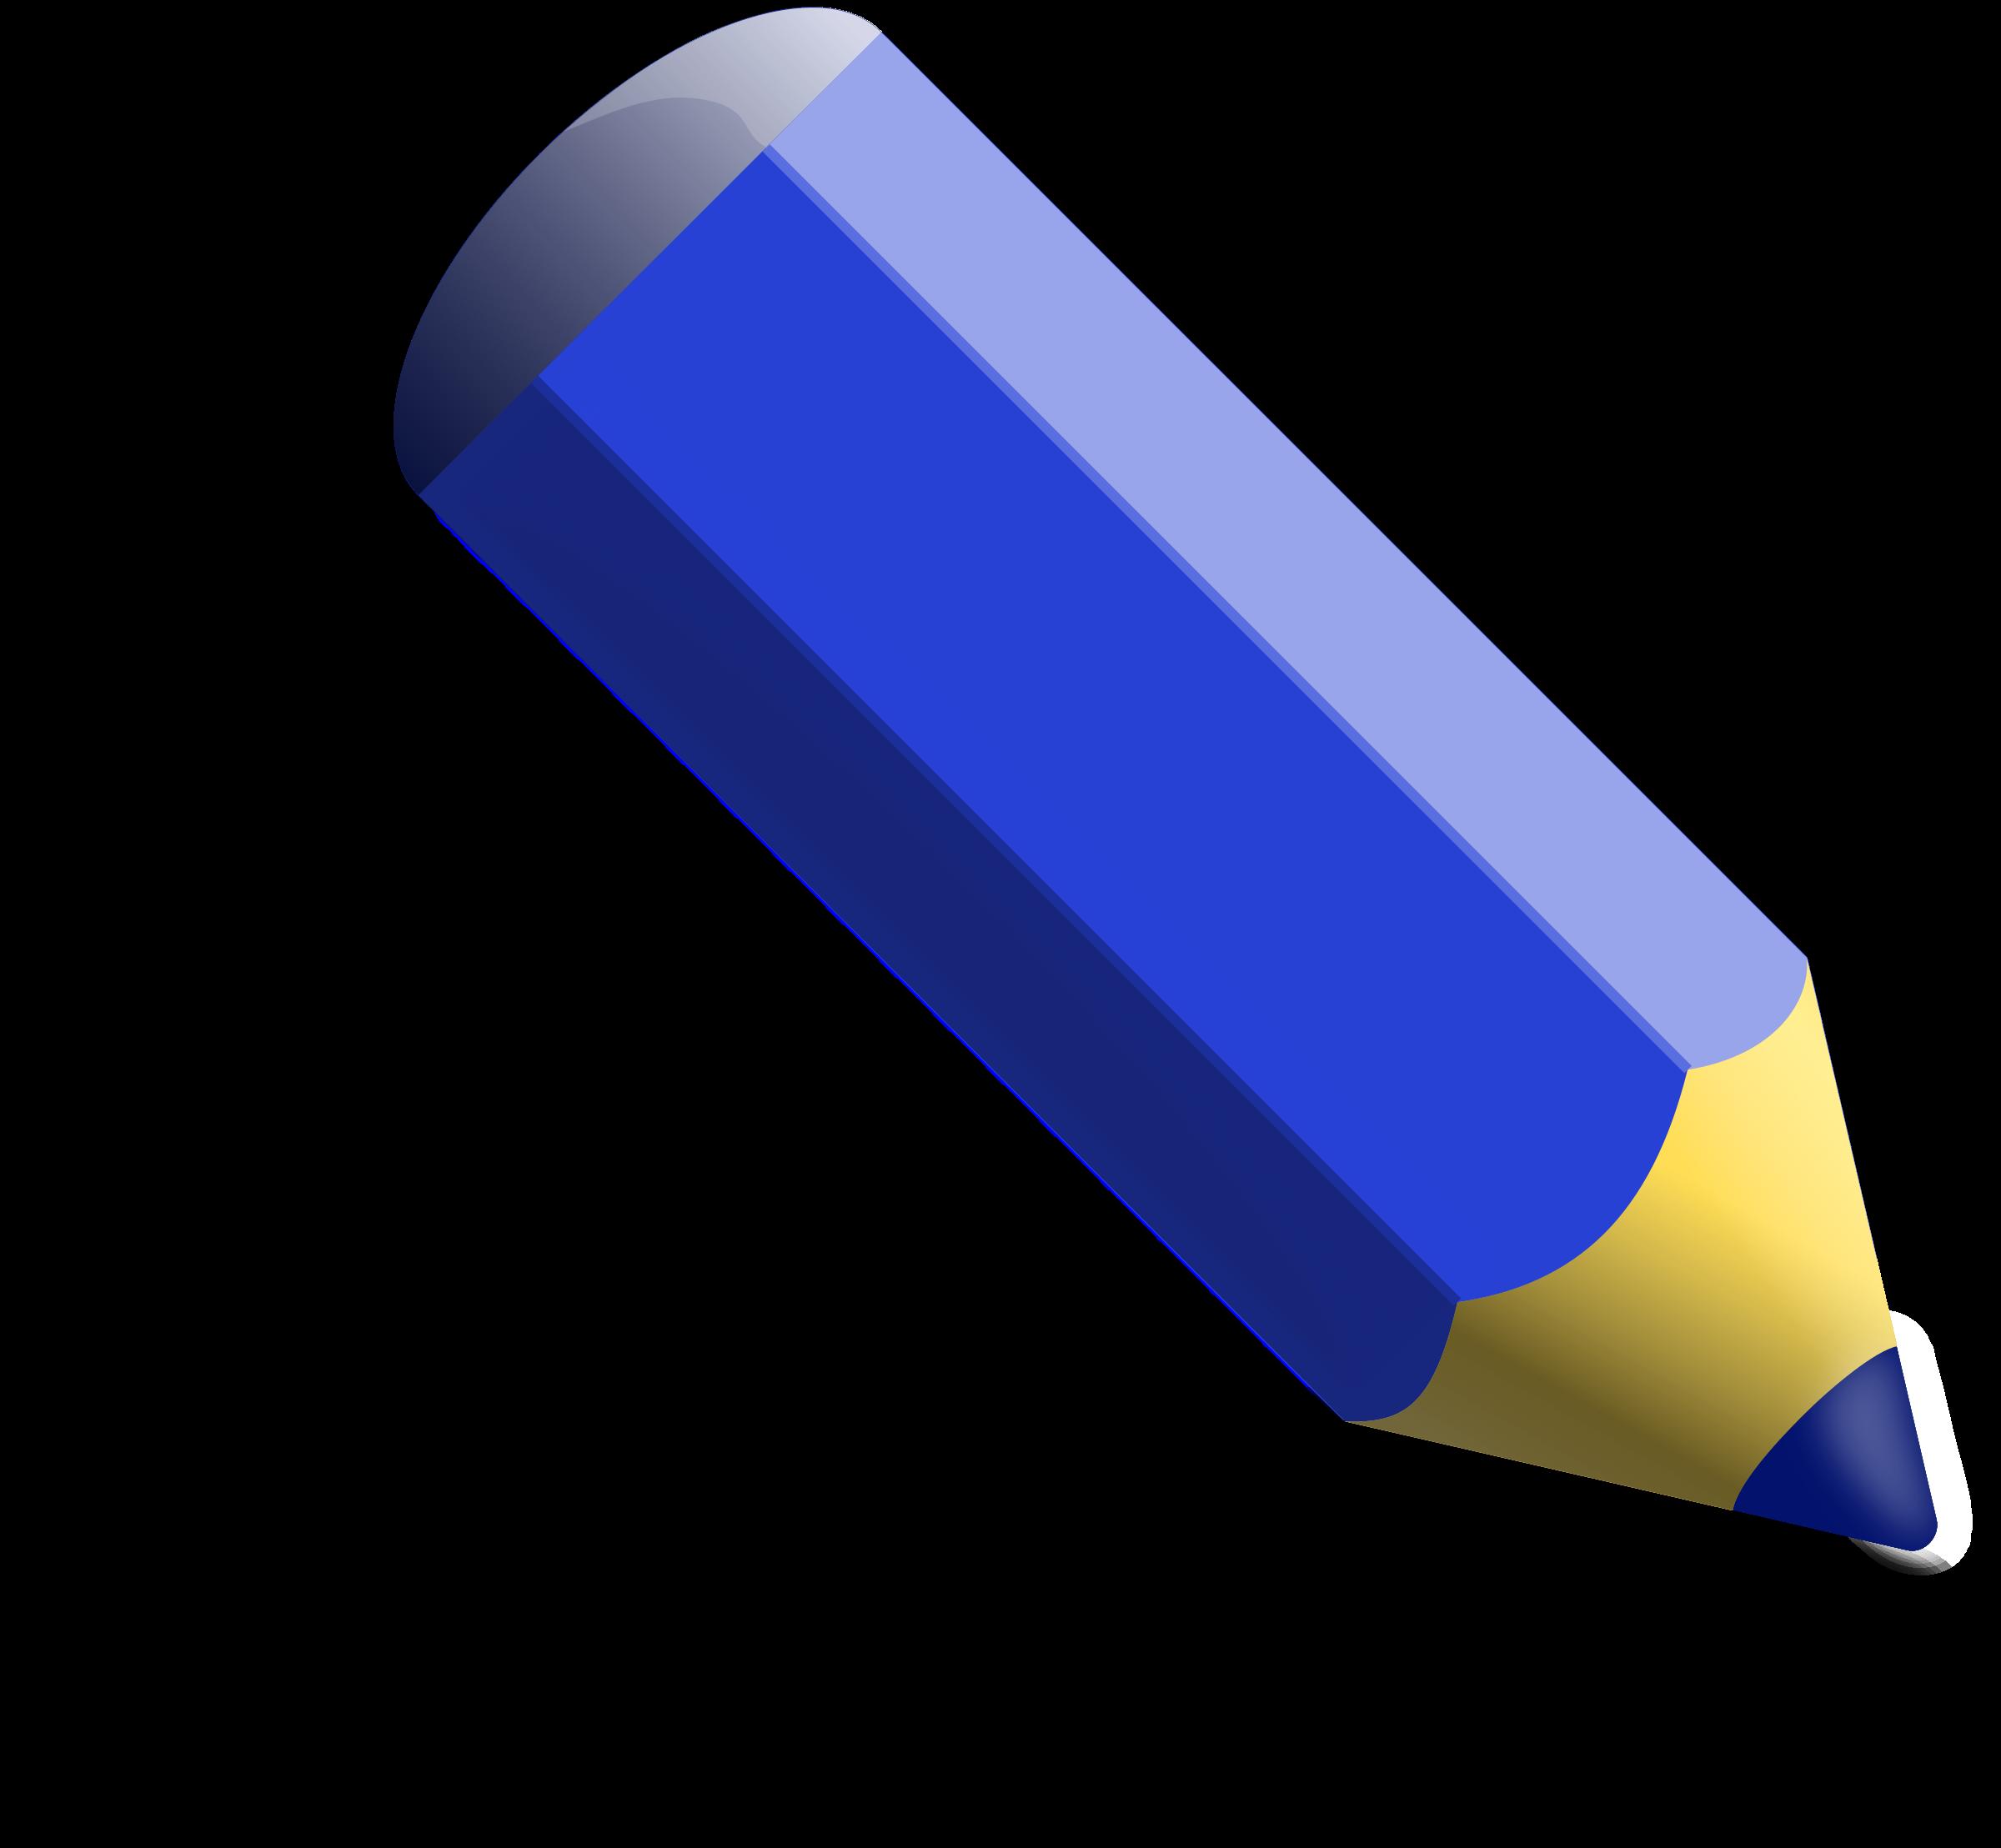 Clipart - Blue pencil